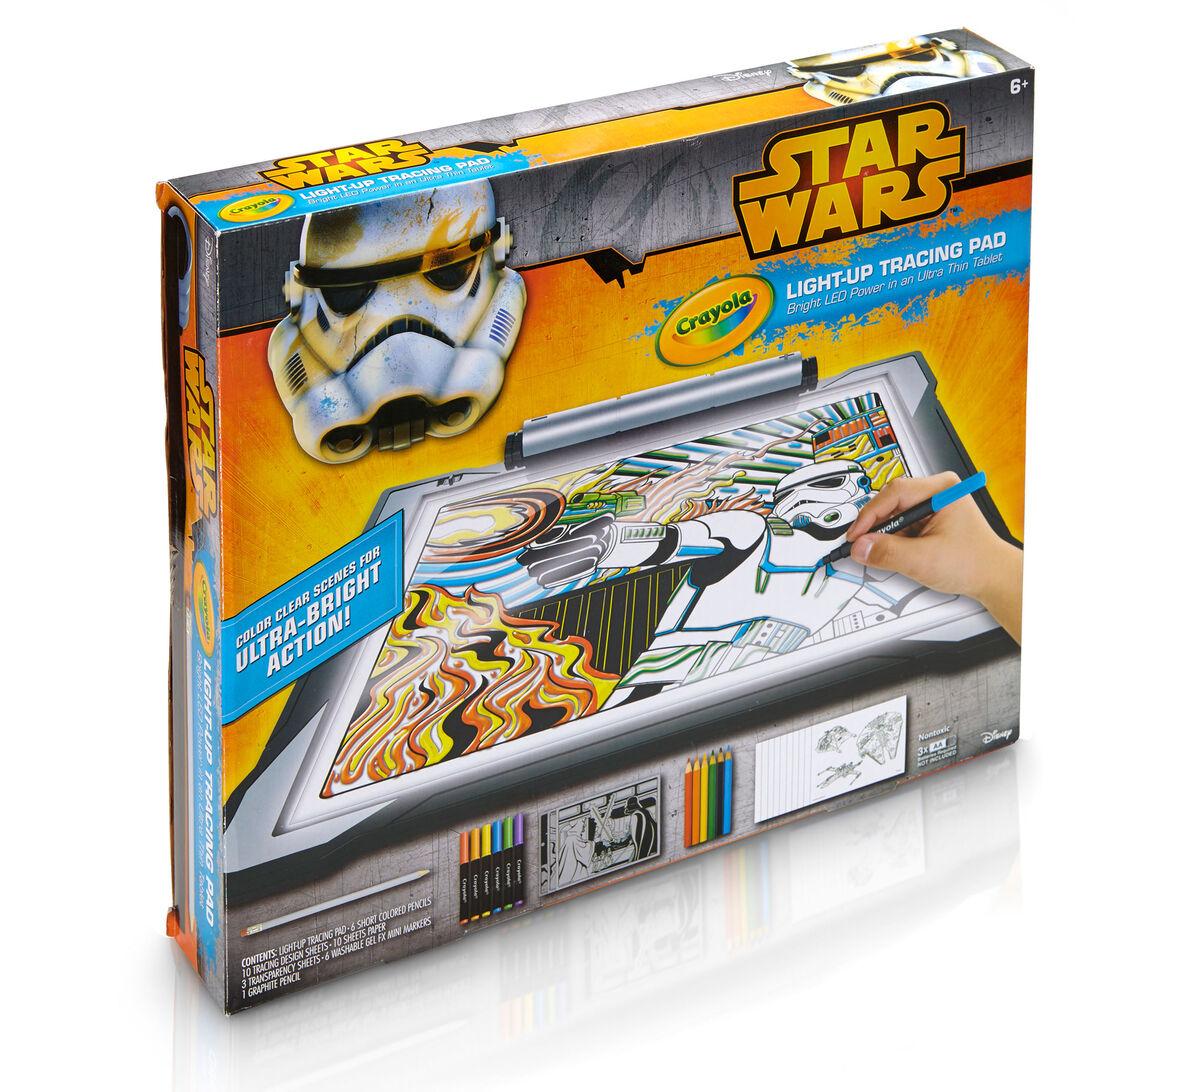 star wars light up tracing pad crayola